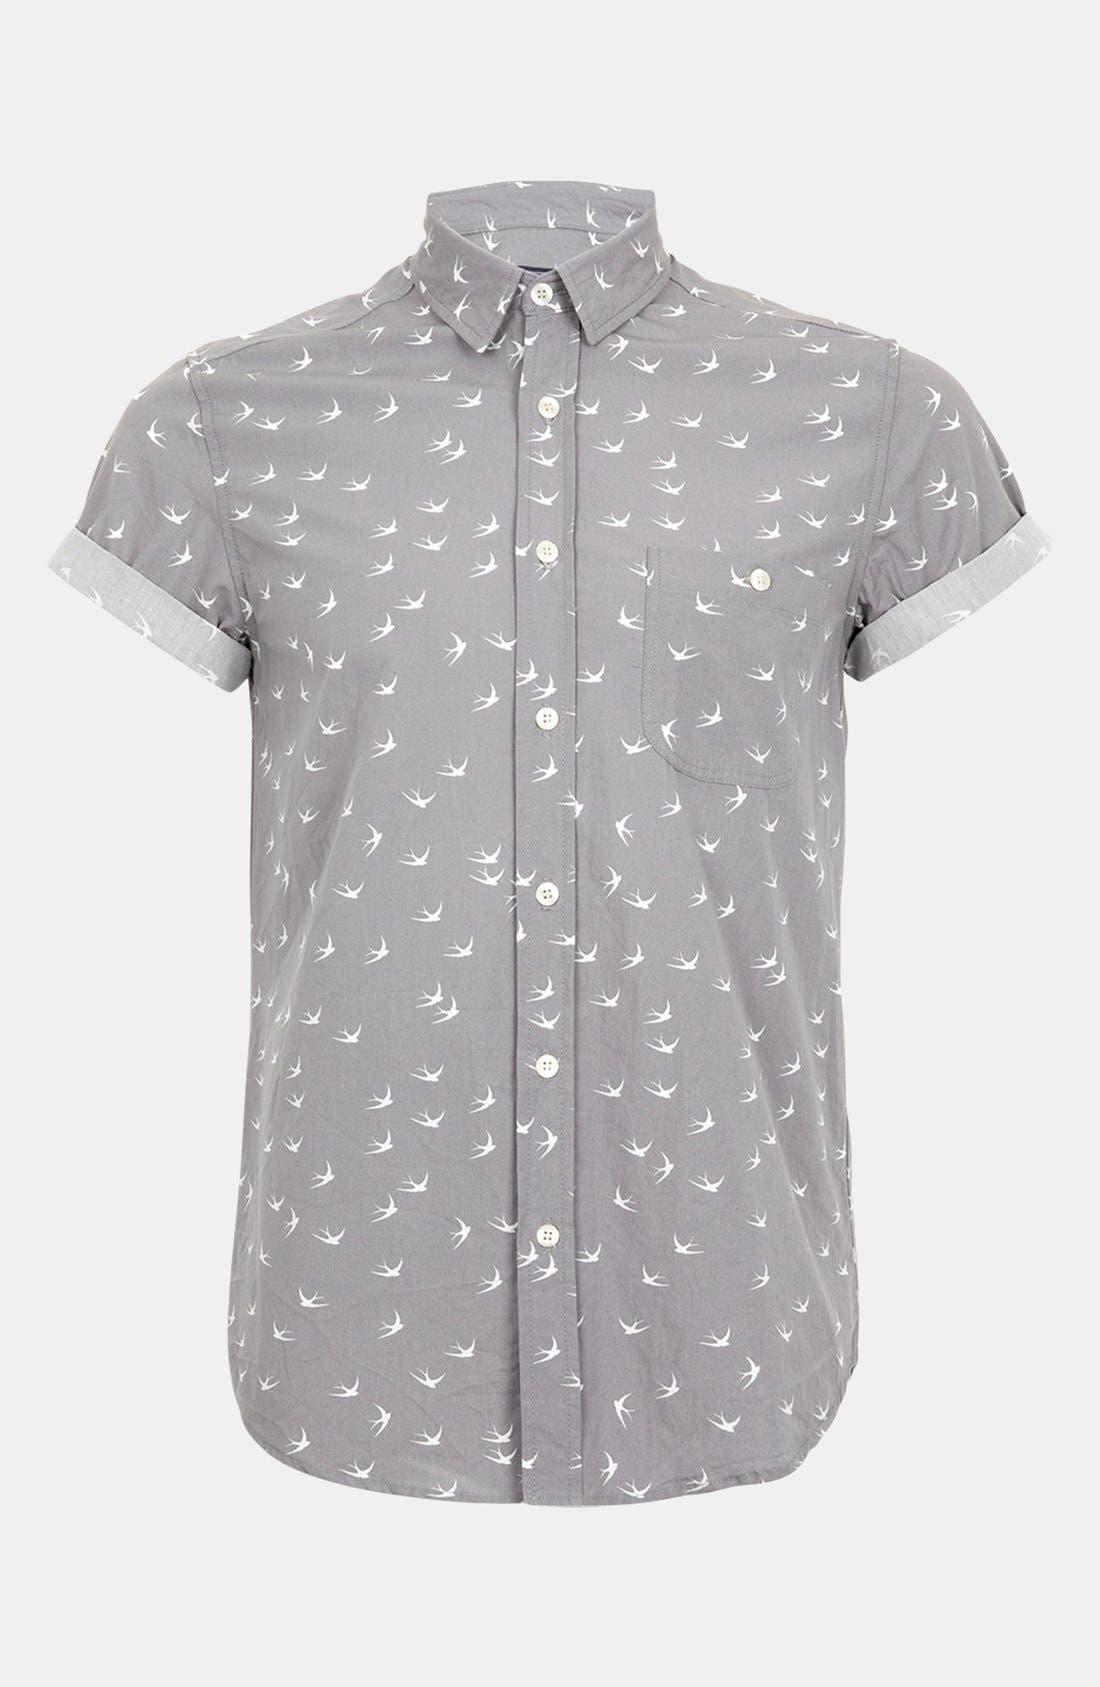 Alternate Image 1 Selected - Topman 'High Roller' Swallow Print Shirt